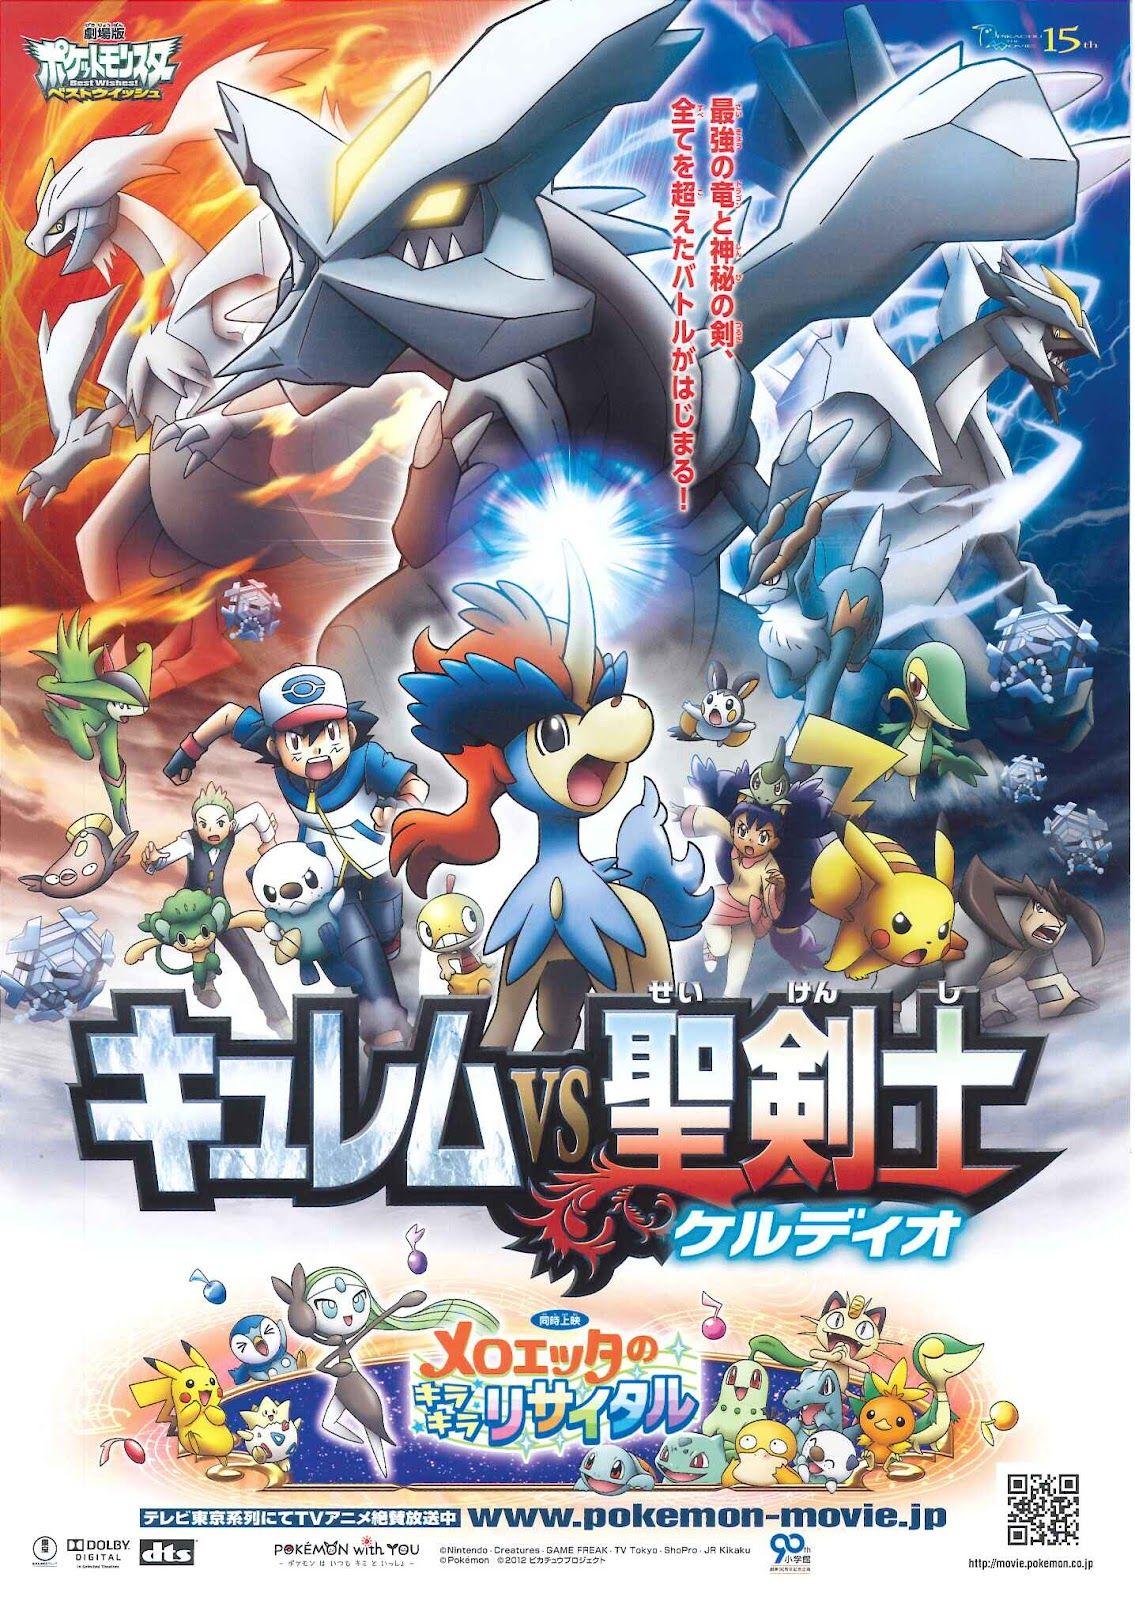 #Pokemon15 > the Movie > Kyurem vs the Sword of Justice [2012] 劇場版ポケットモンスター ベストウイッシュ キュレムVS聖剣士 ケルディオ